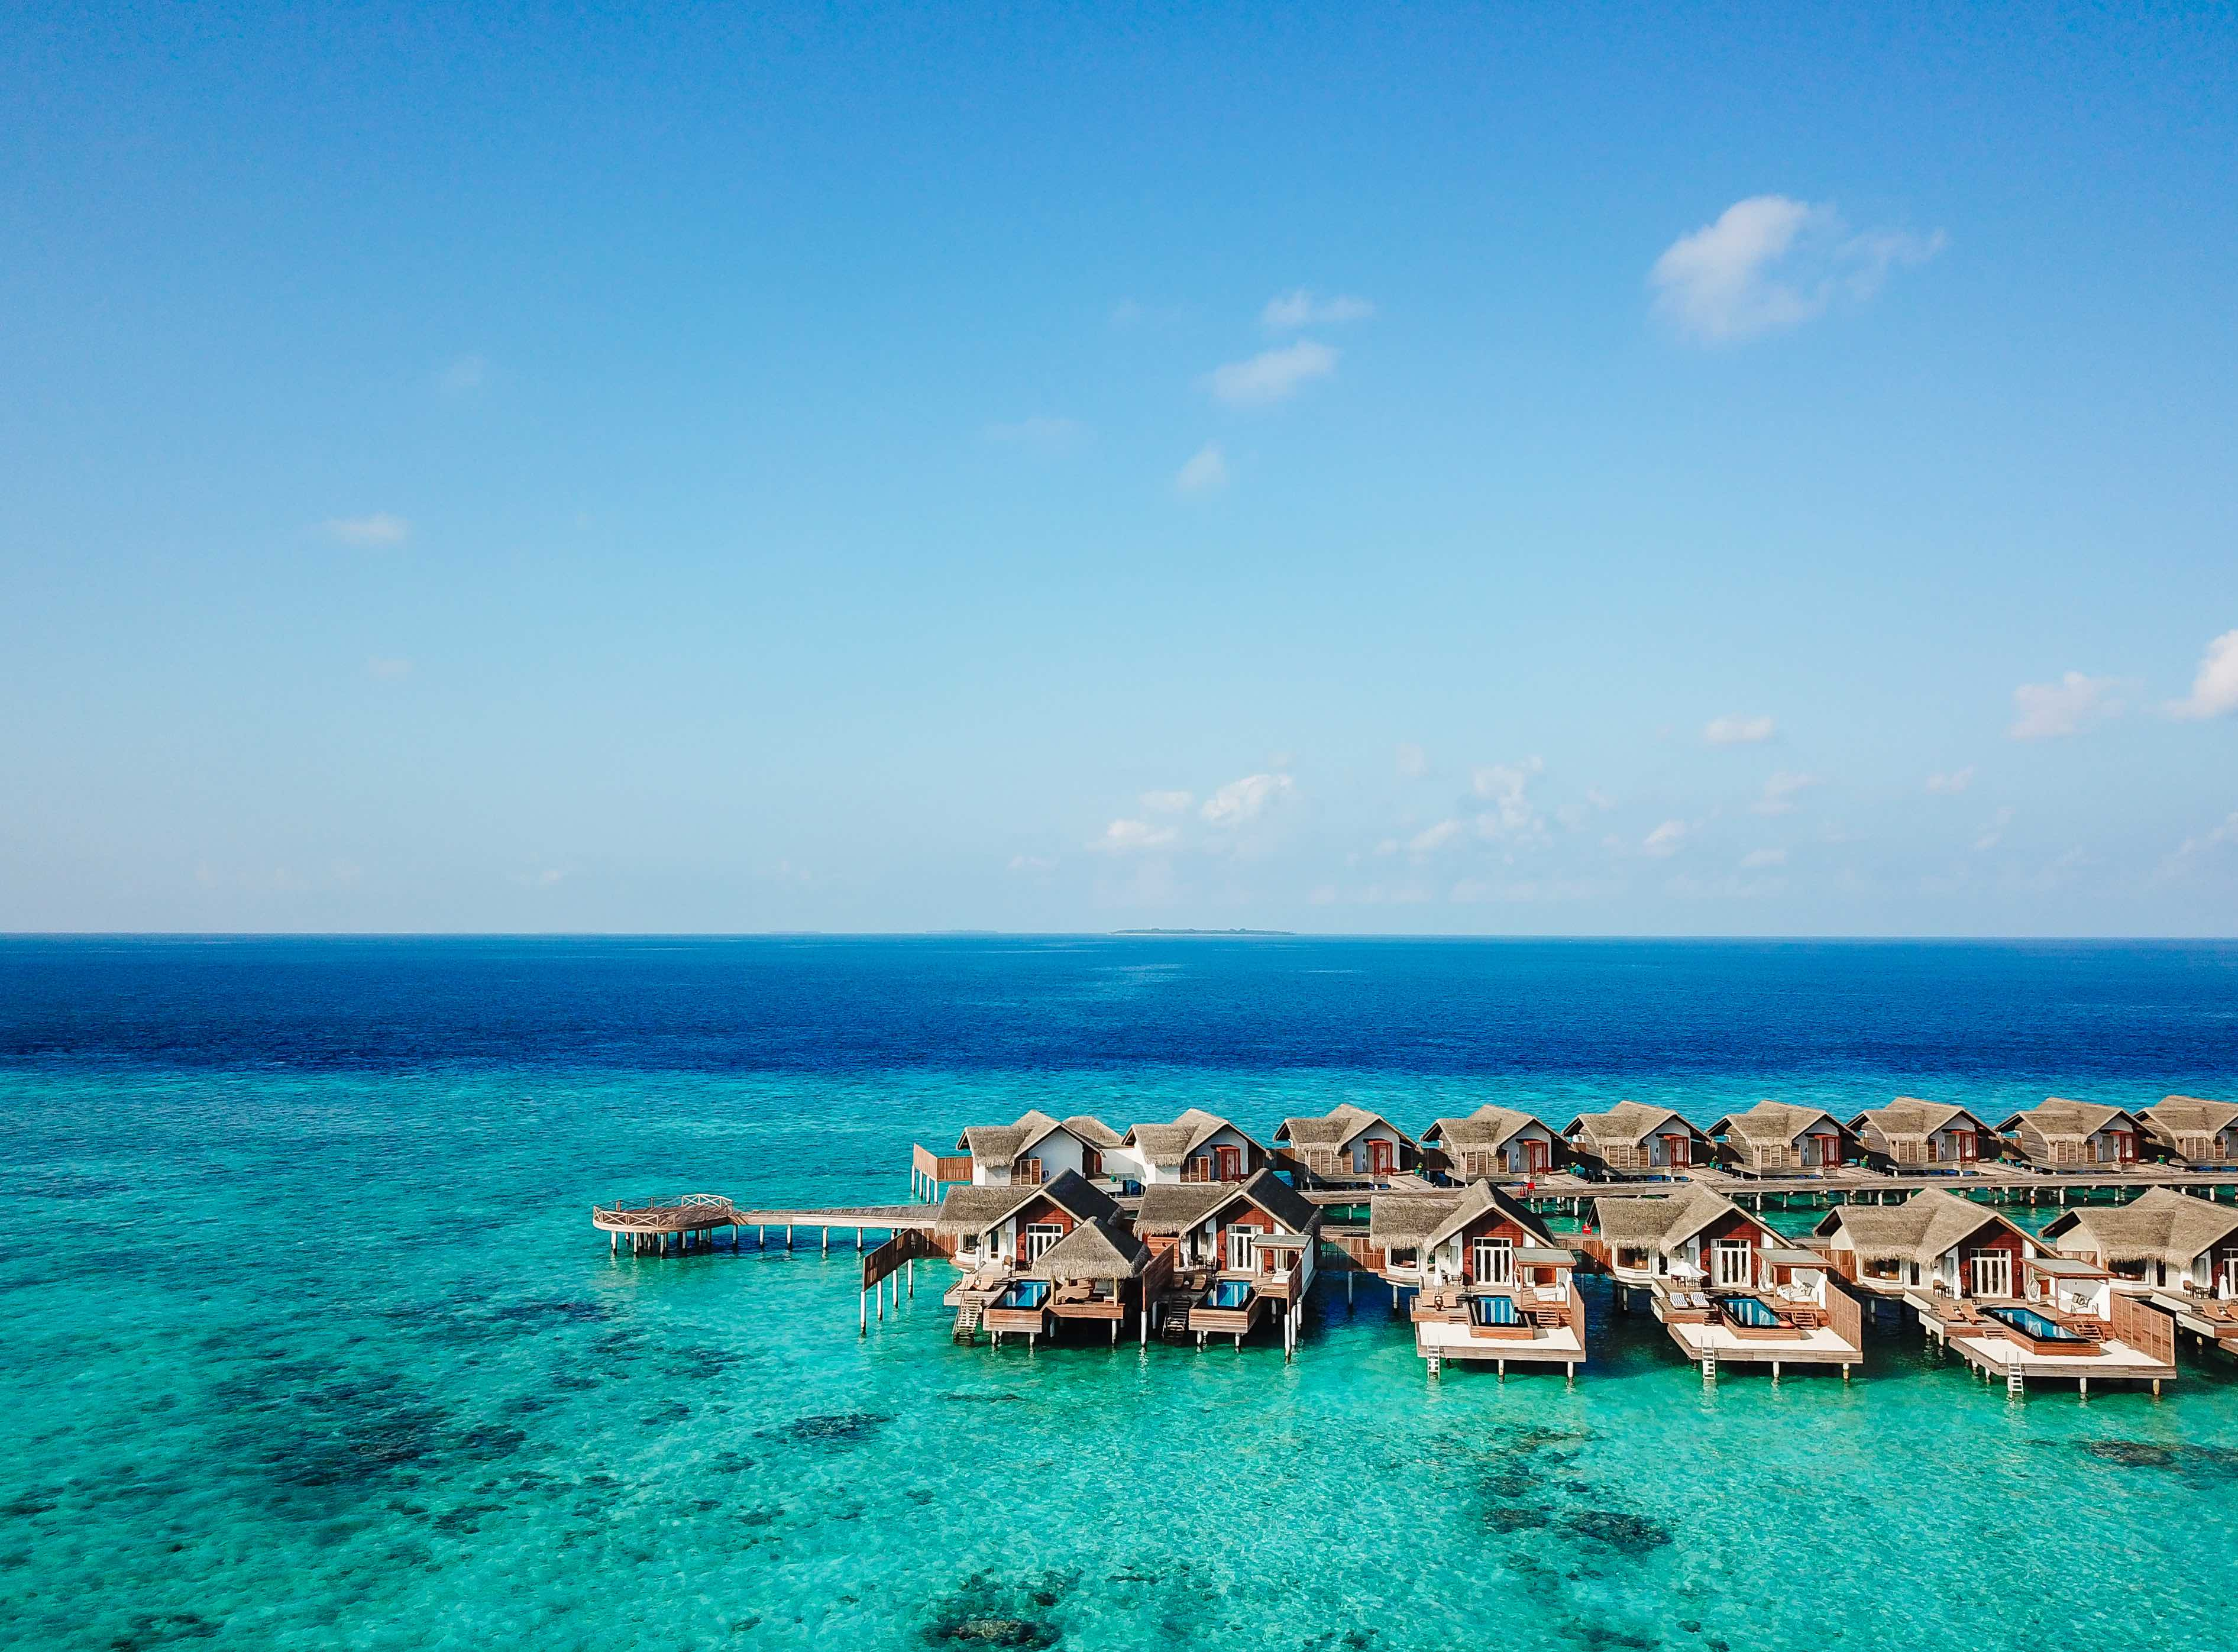 Fairmont Maldives Sirru Fen Fushi: tropisches Paradies